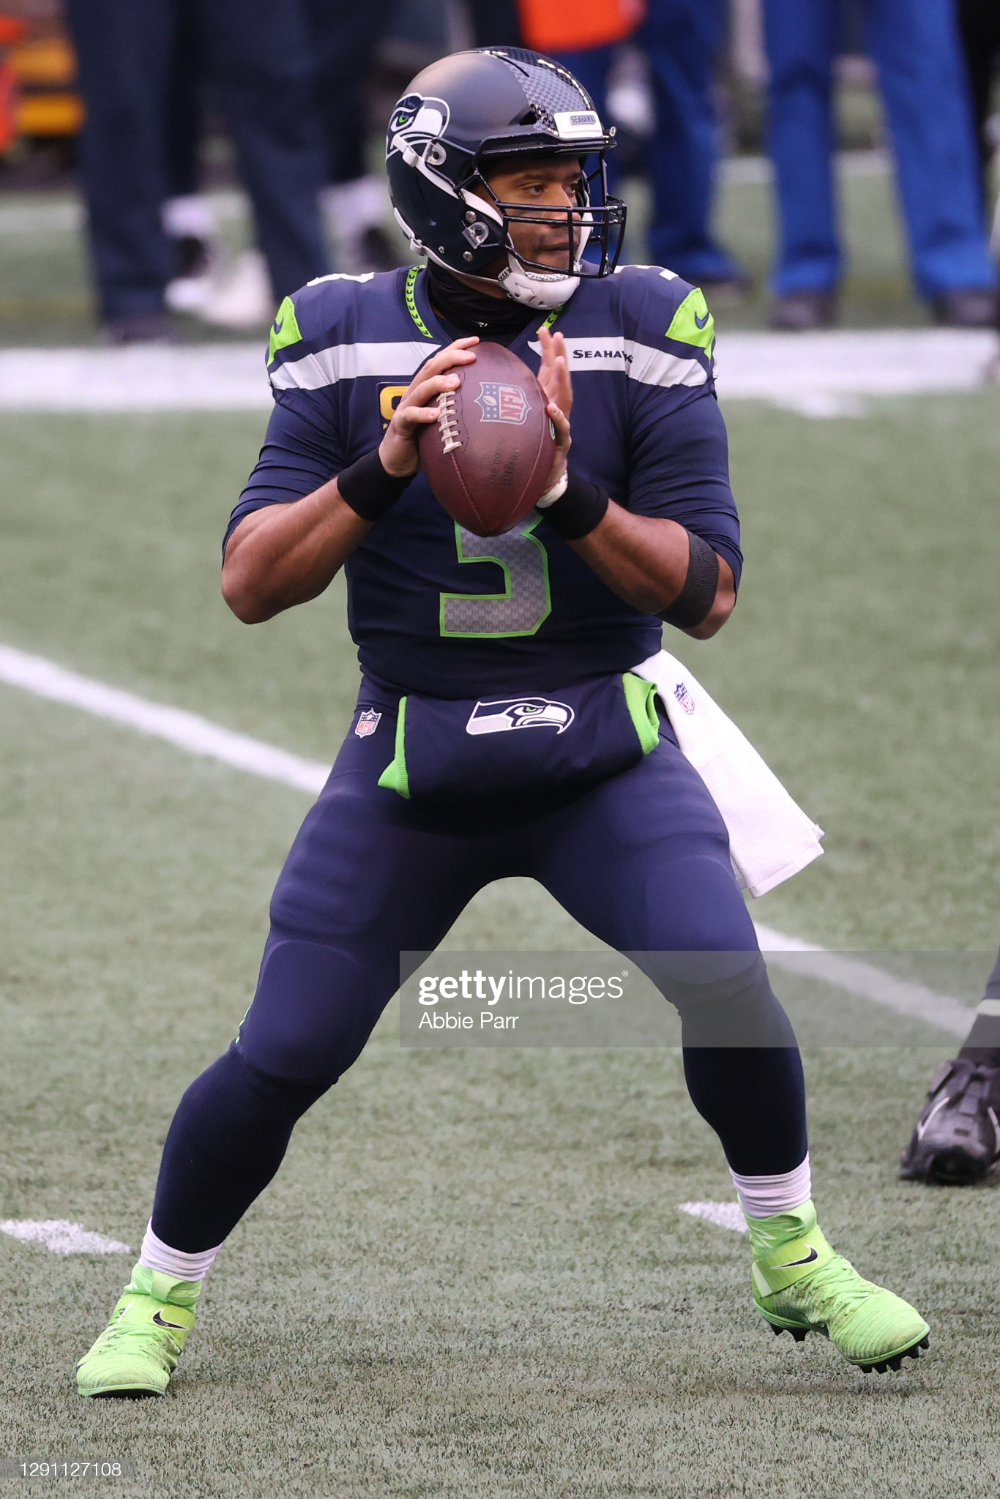 Russell Wilson Of The Seattle Seahawks Looks To Throw The Ball In The In 2020 Seattle Seahawks Russell Wilson Seahawks